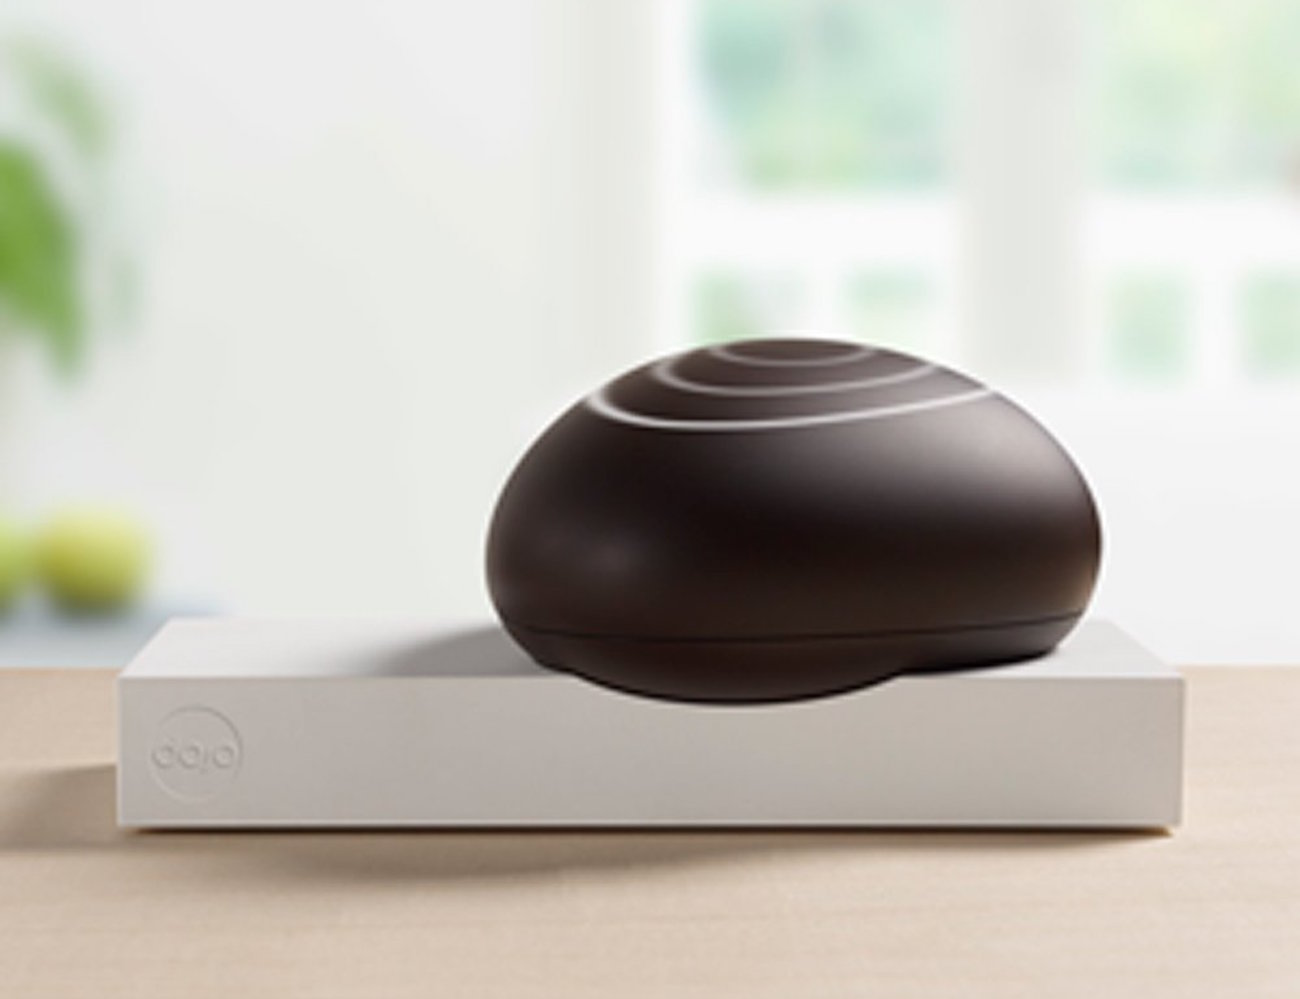 Dojo – The Ultimate Internet Security Device